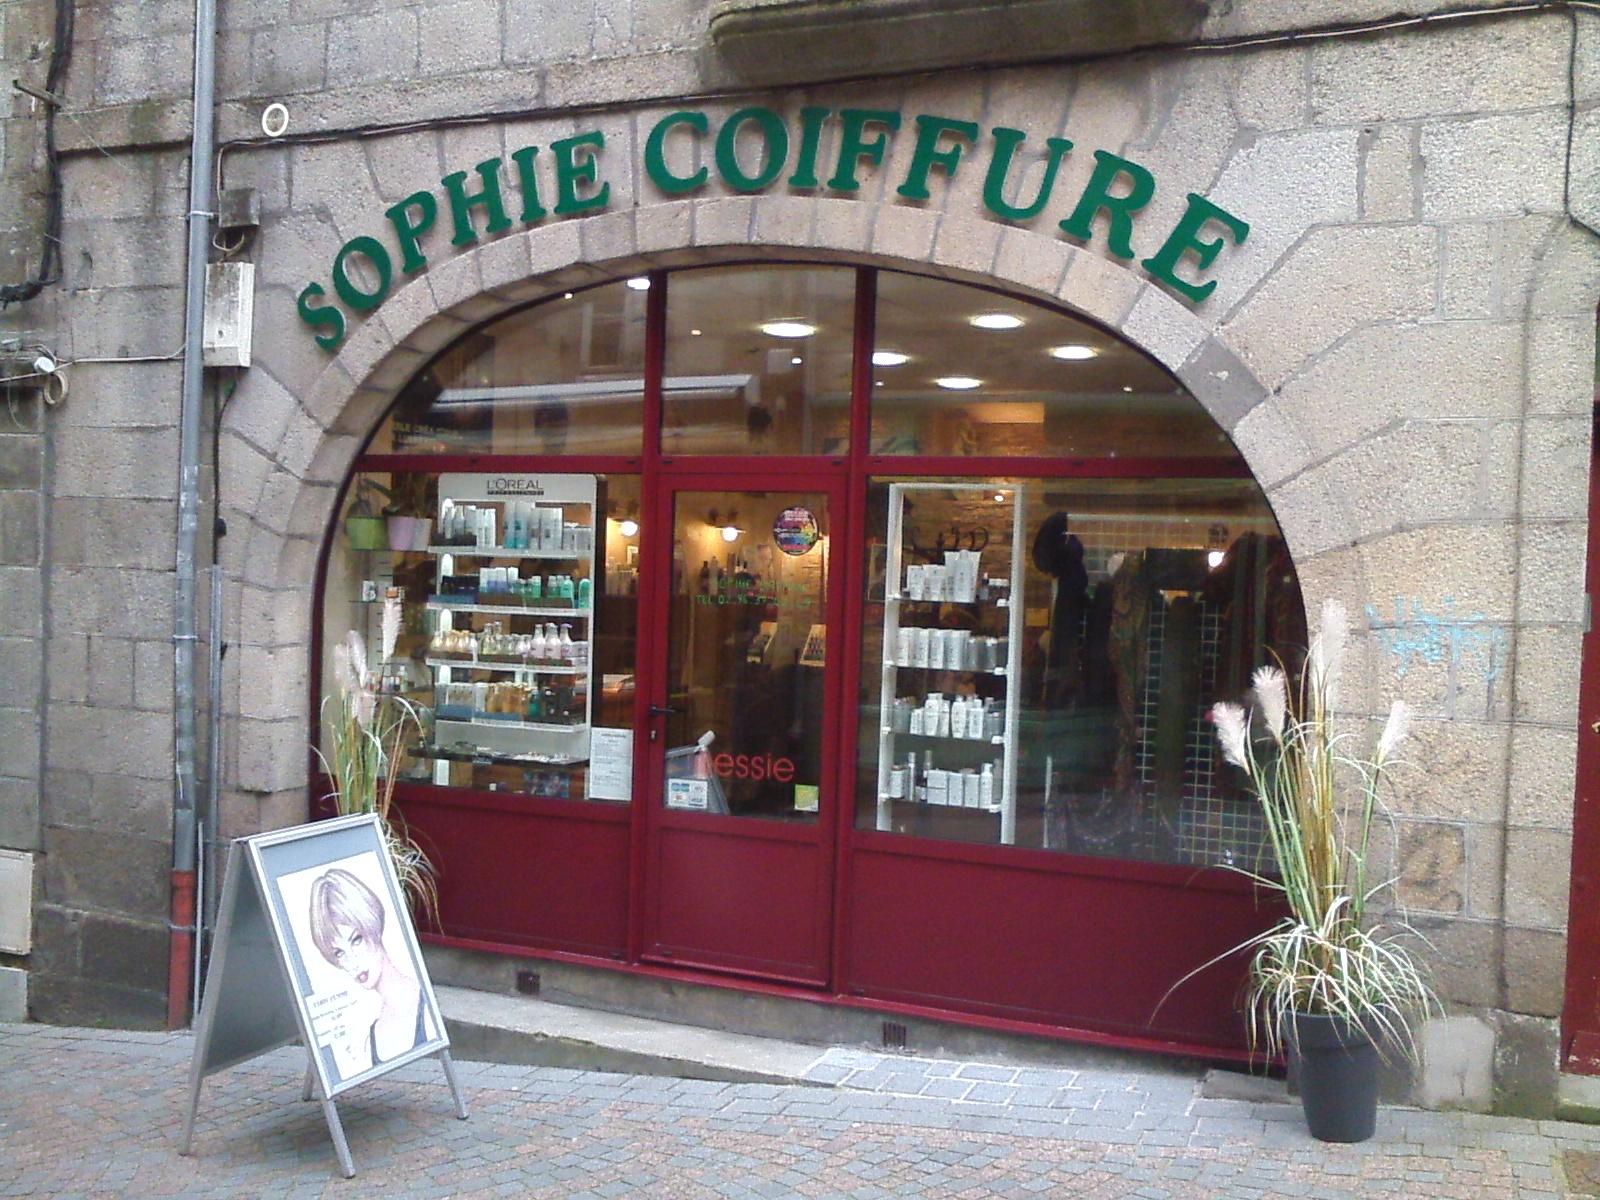 Sophie Coiffure Lannion - Avis Tarifs Horaires Tu00e9lu00e9phone